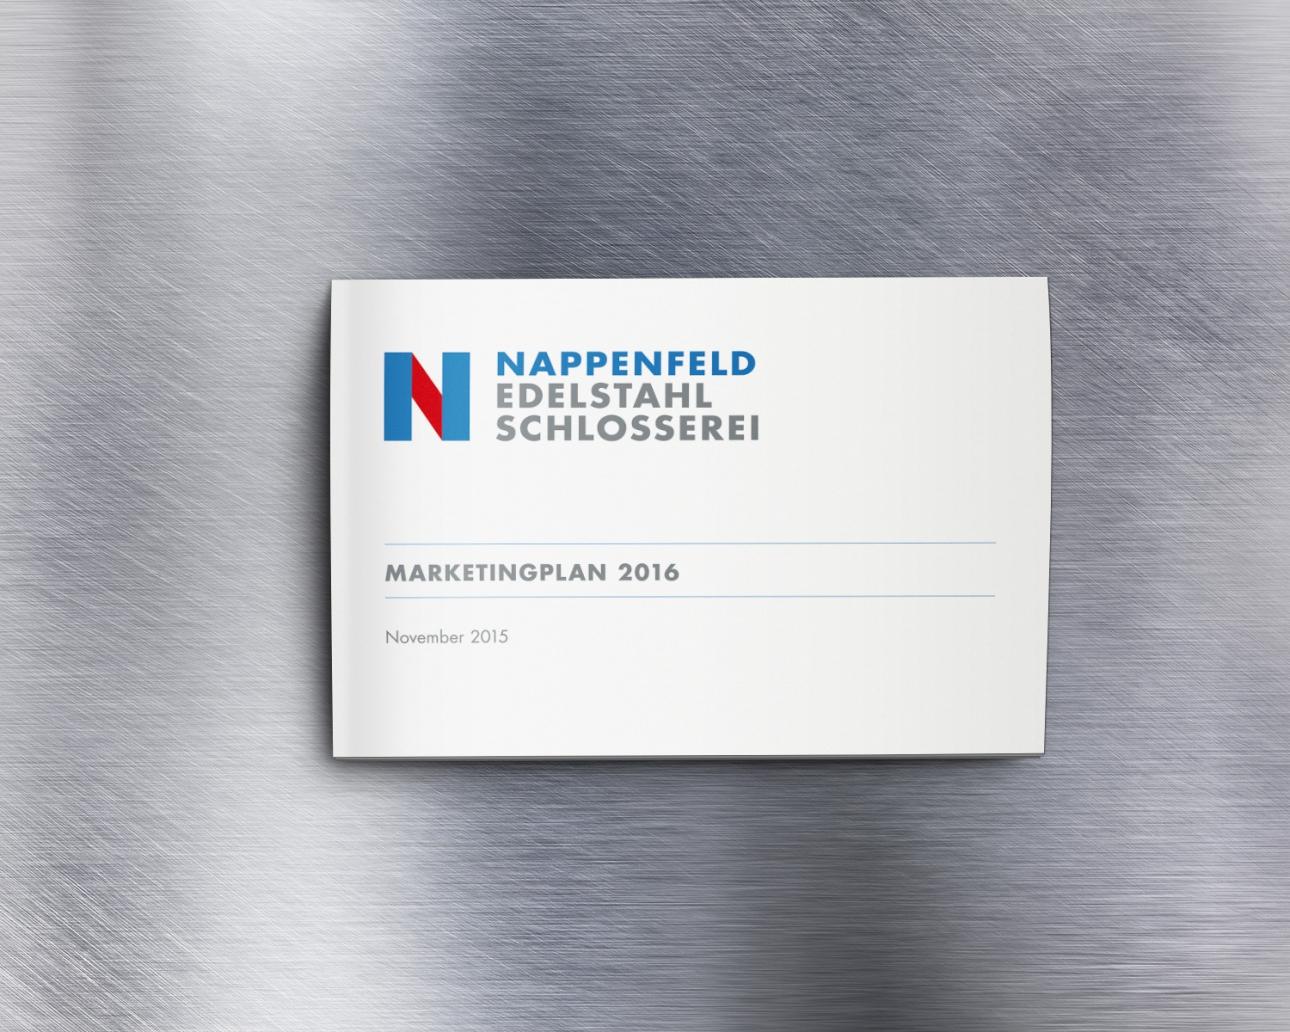 Marketingplan Cover für Nappenfeld